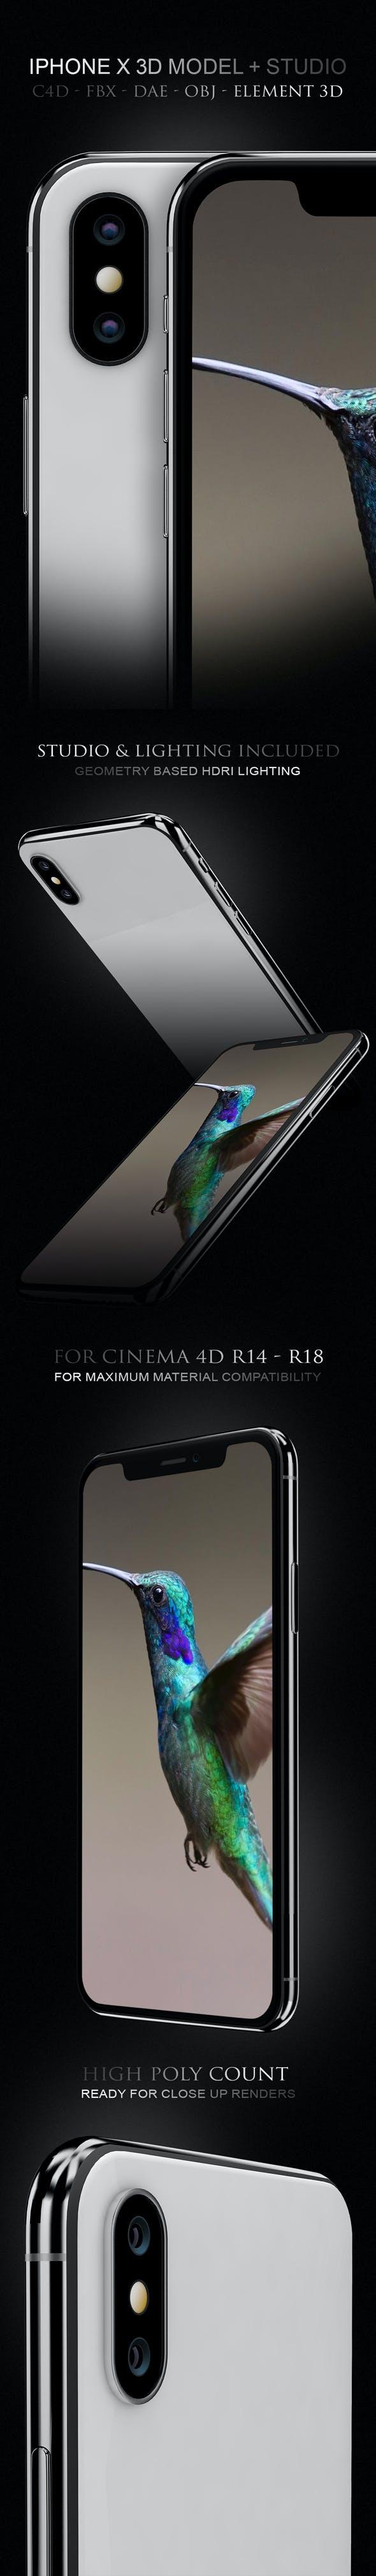 IPhone X 3D Model - 3DOcean Item for Sale